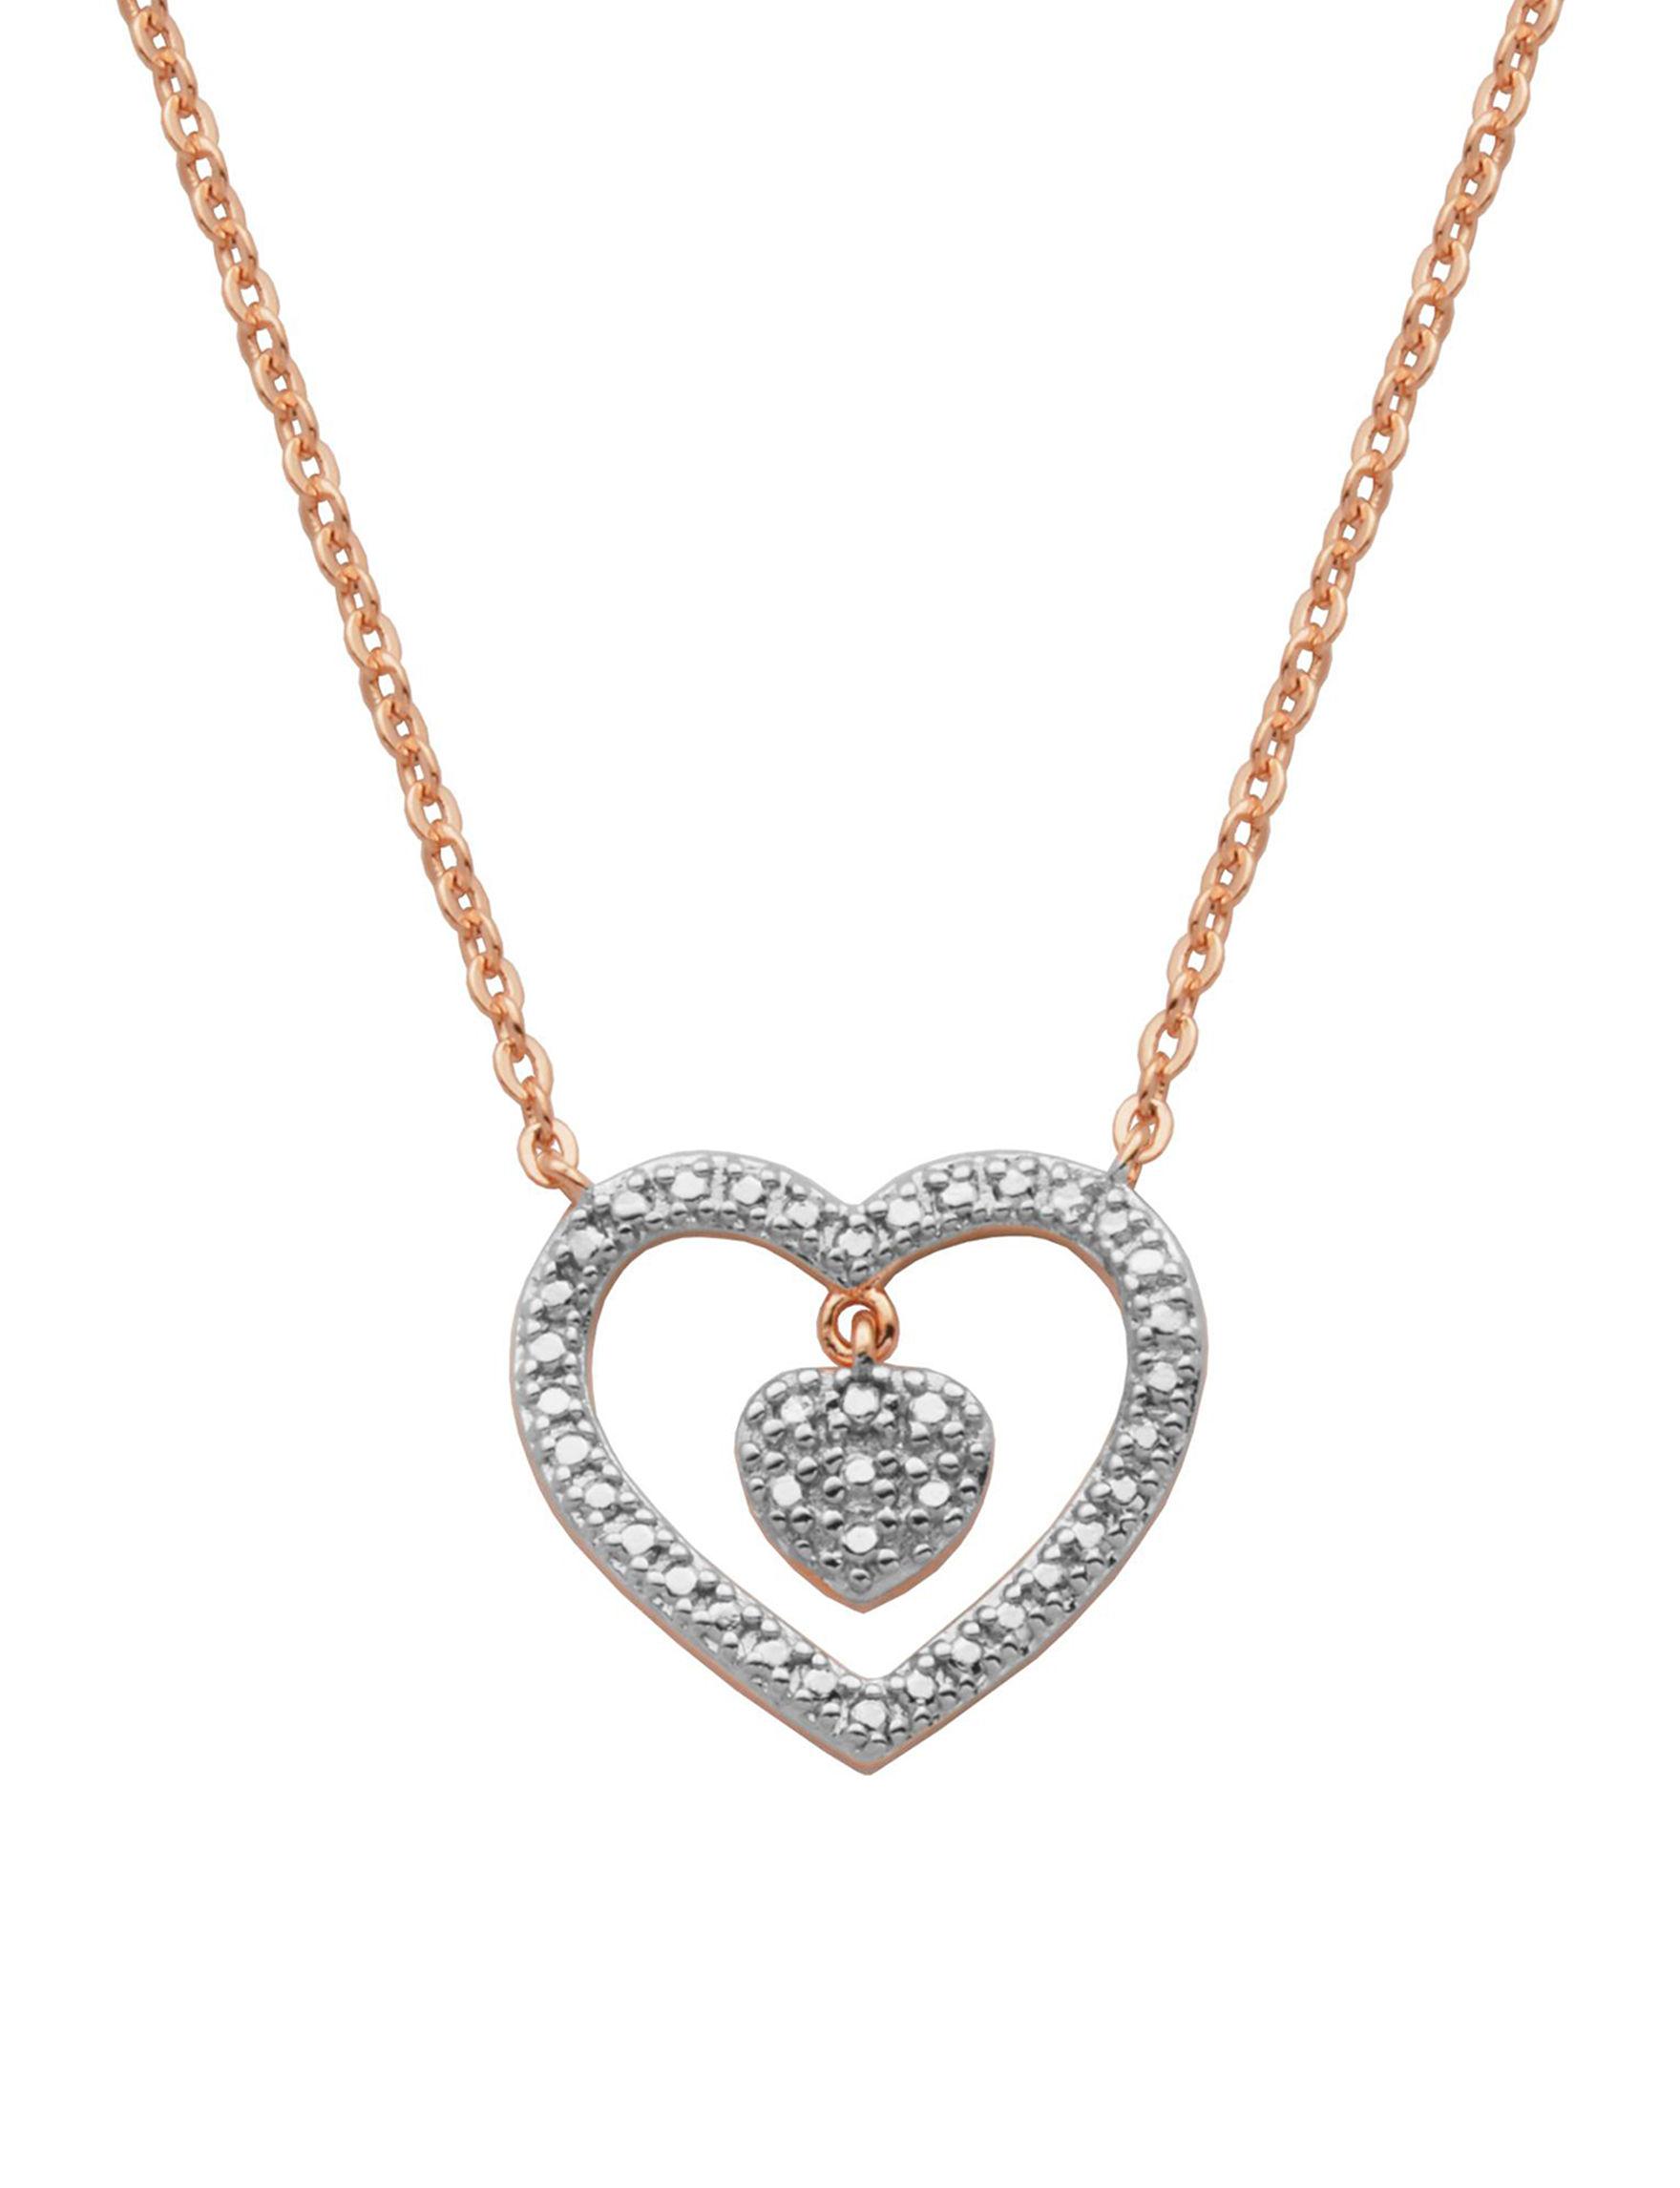 PAJ INC. Two Tone Necklaces & Pendants Fine Jewelry